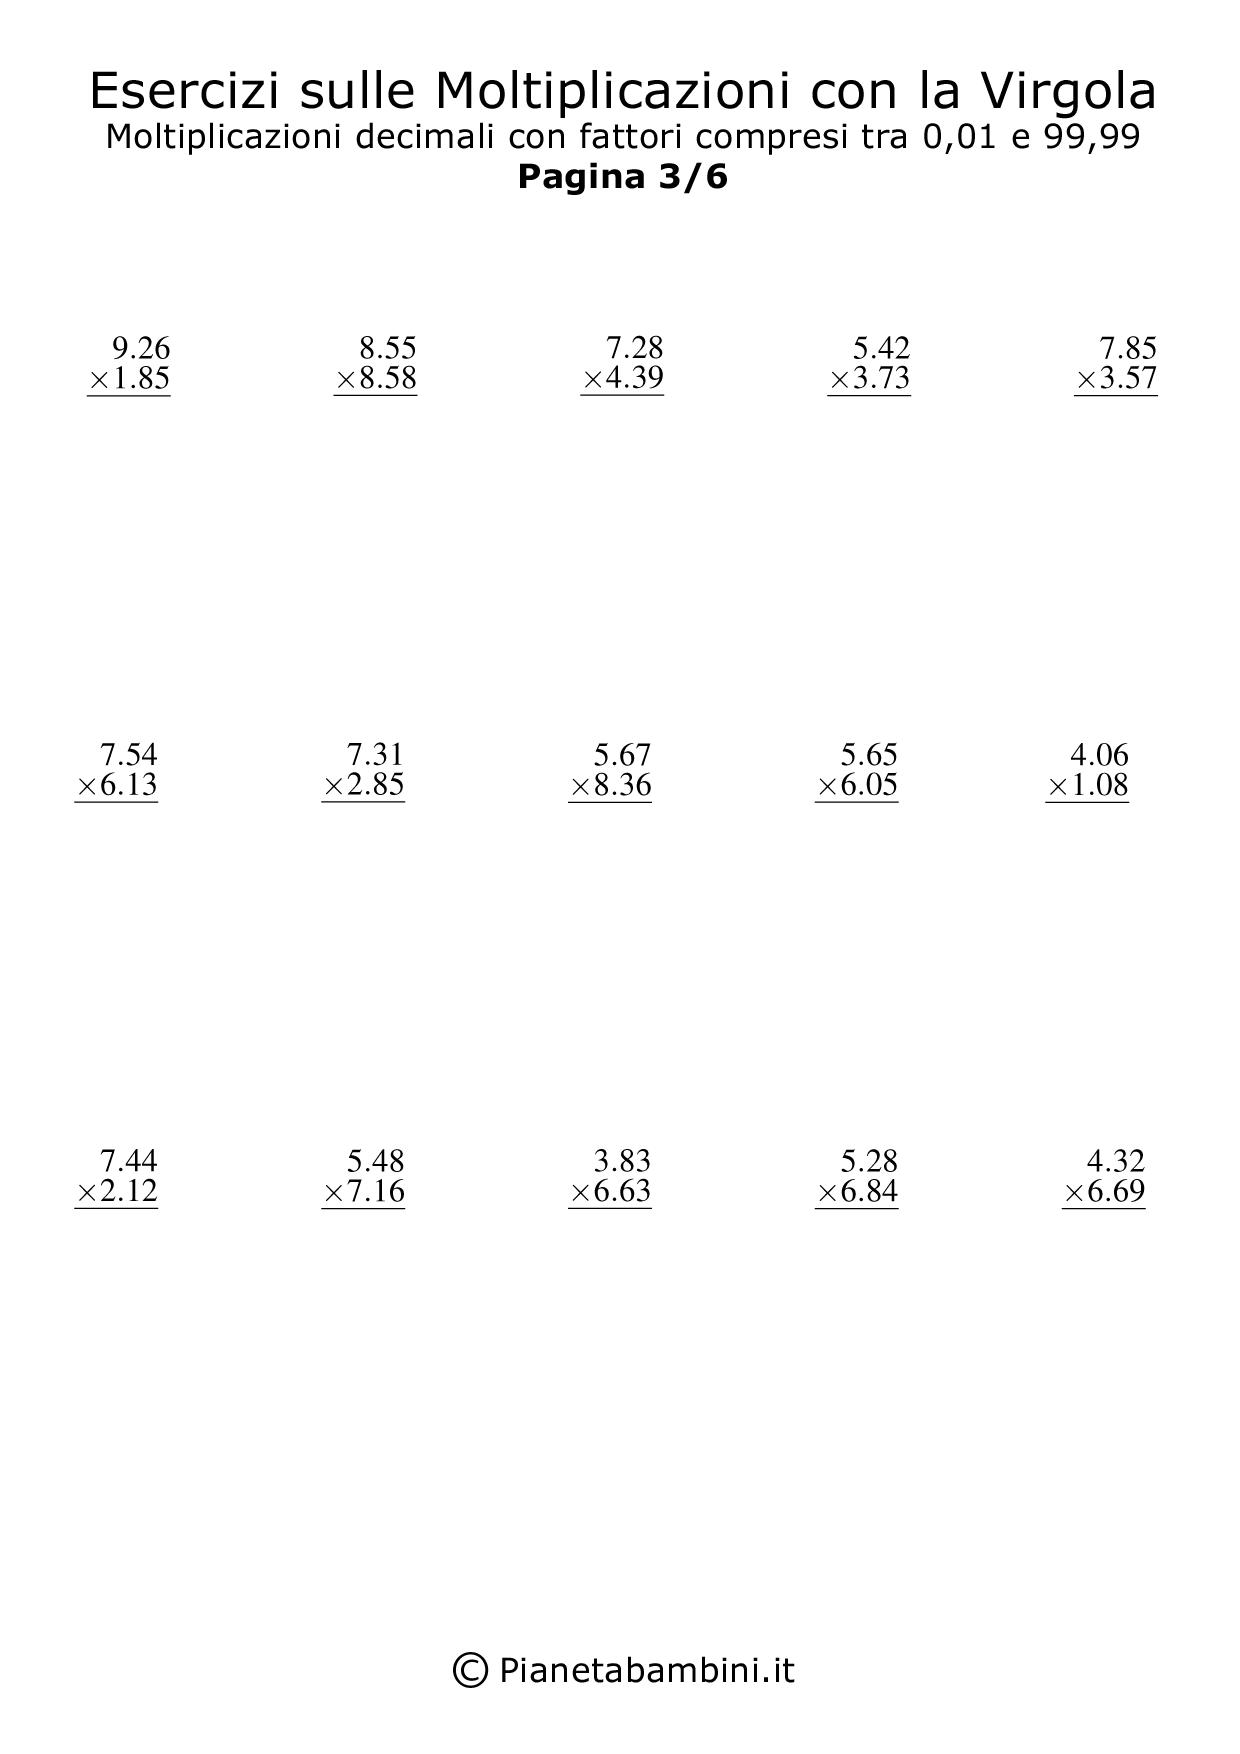 Moltiplicazioni-Virgola-0.01-99.99_3